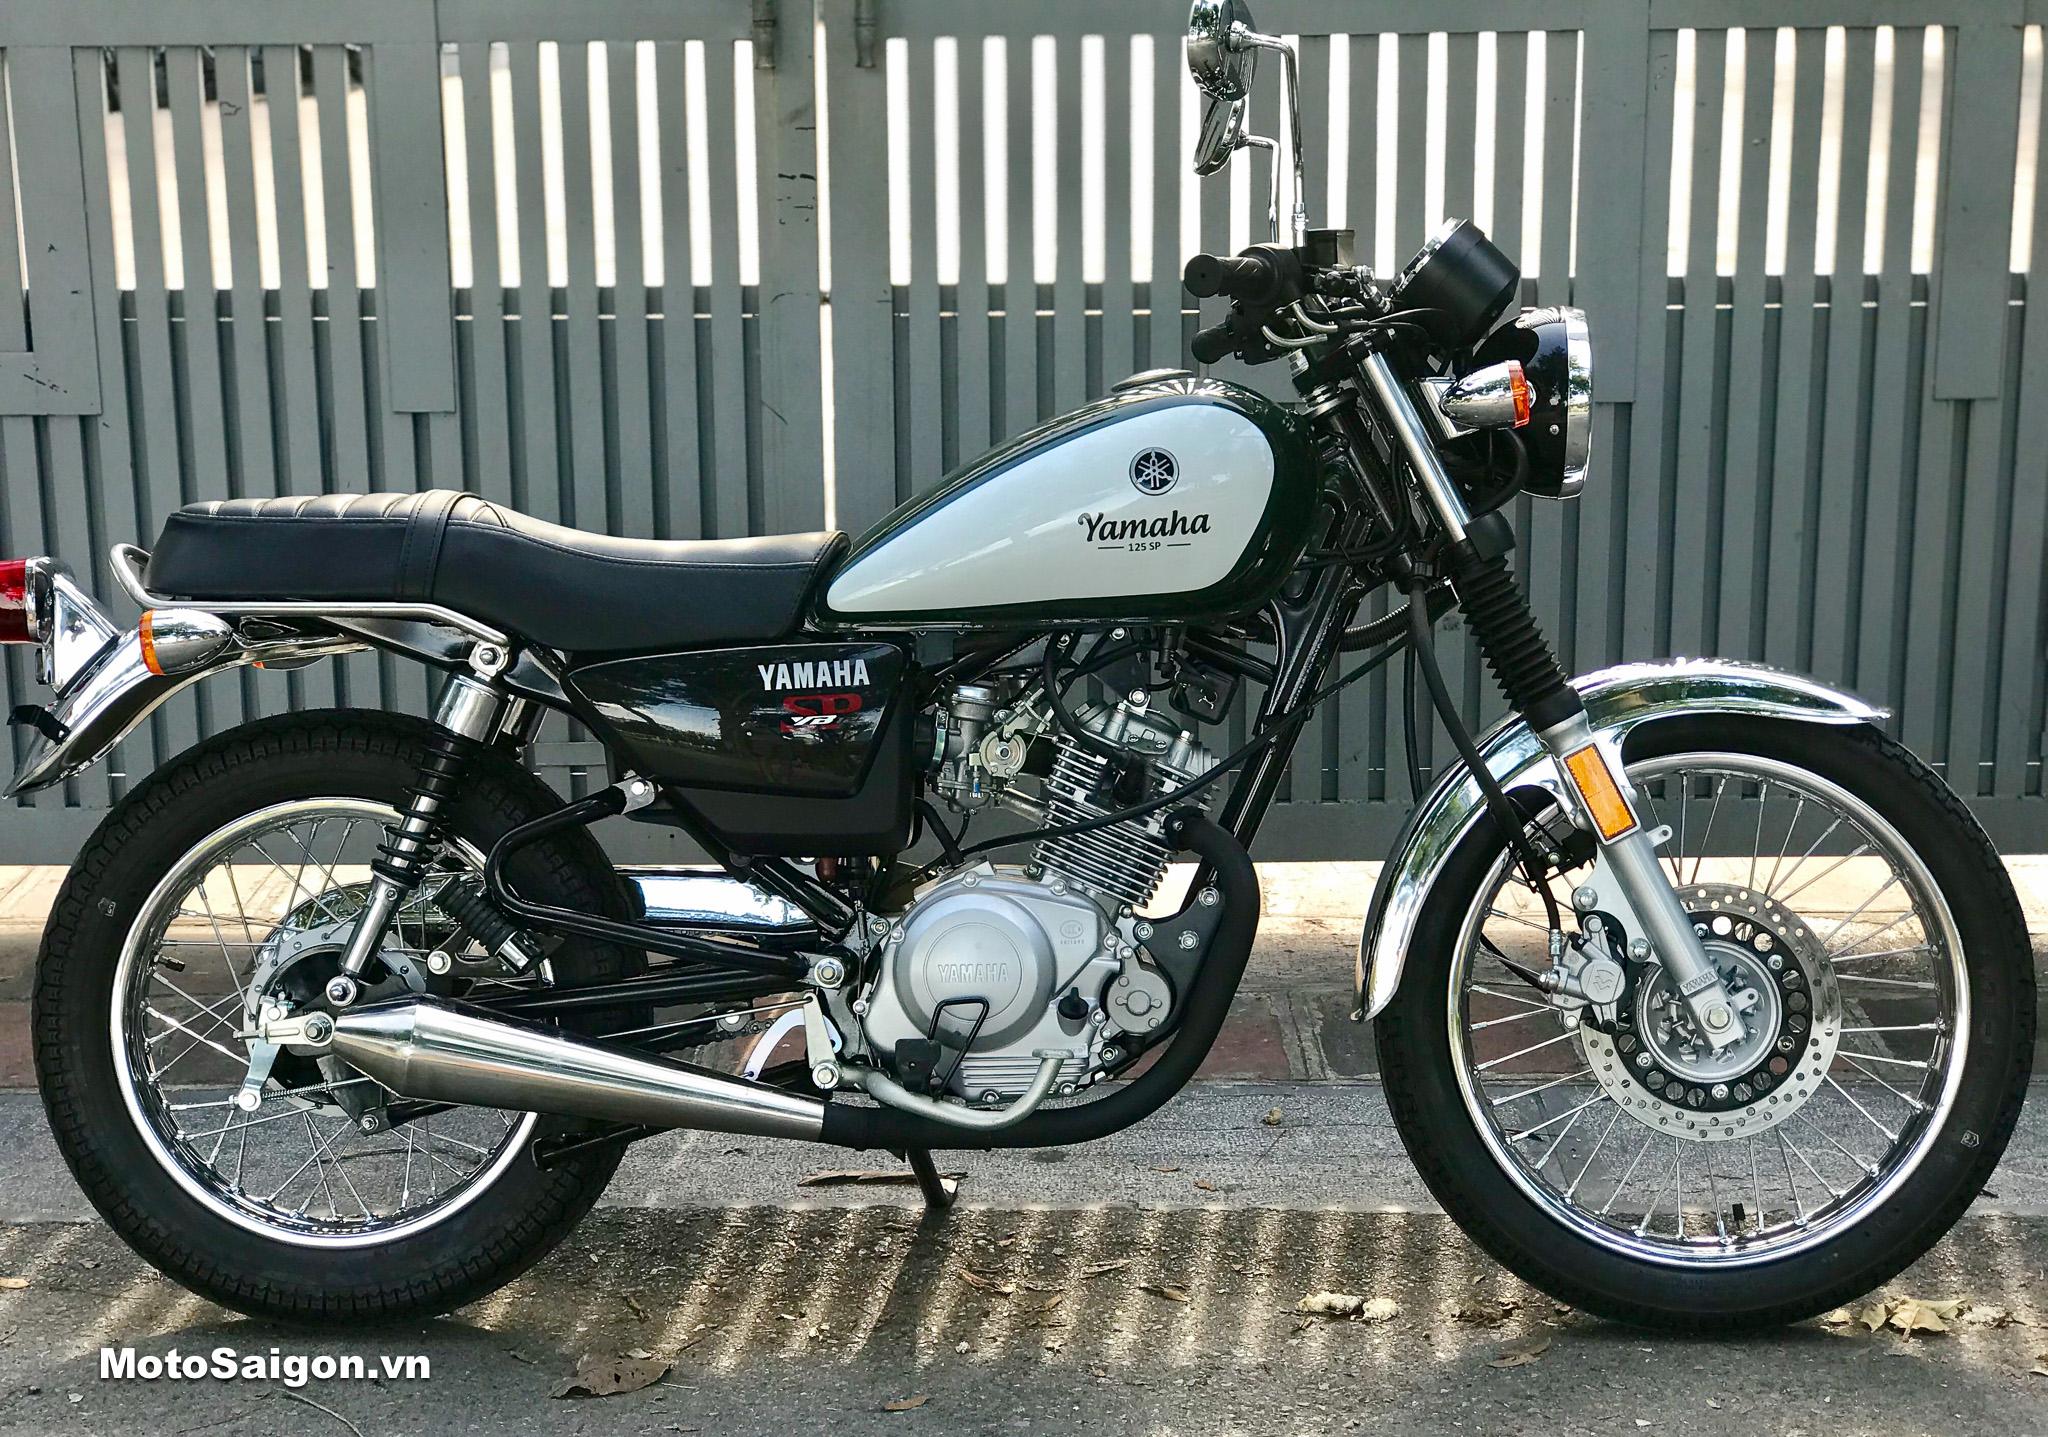 yamaha yb125 2020 do dep danh gia xe motosaigon 6